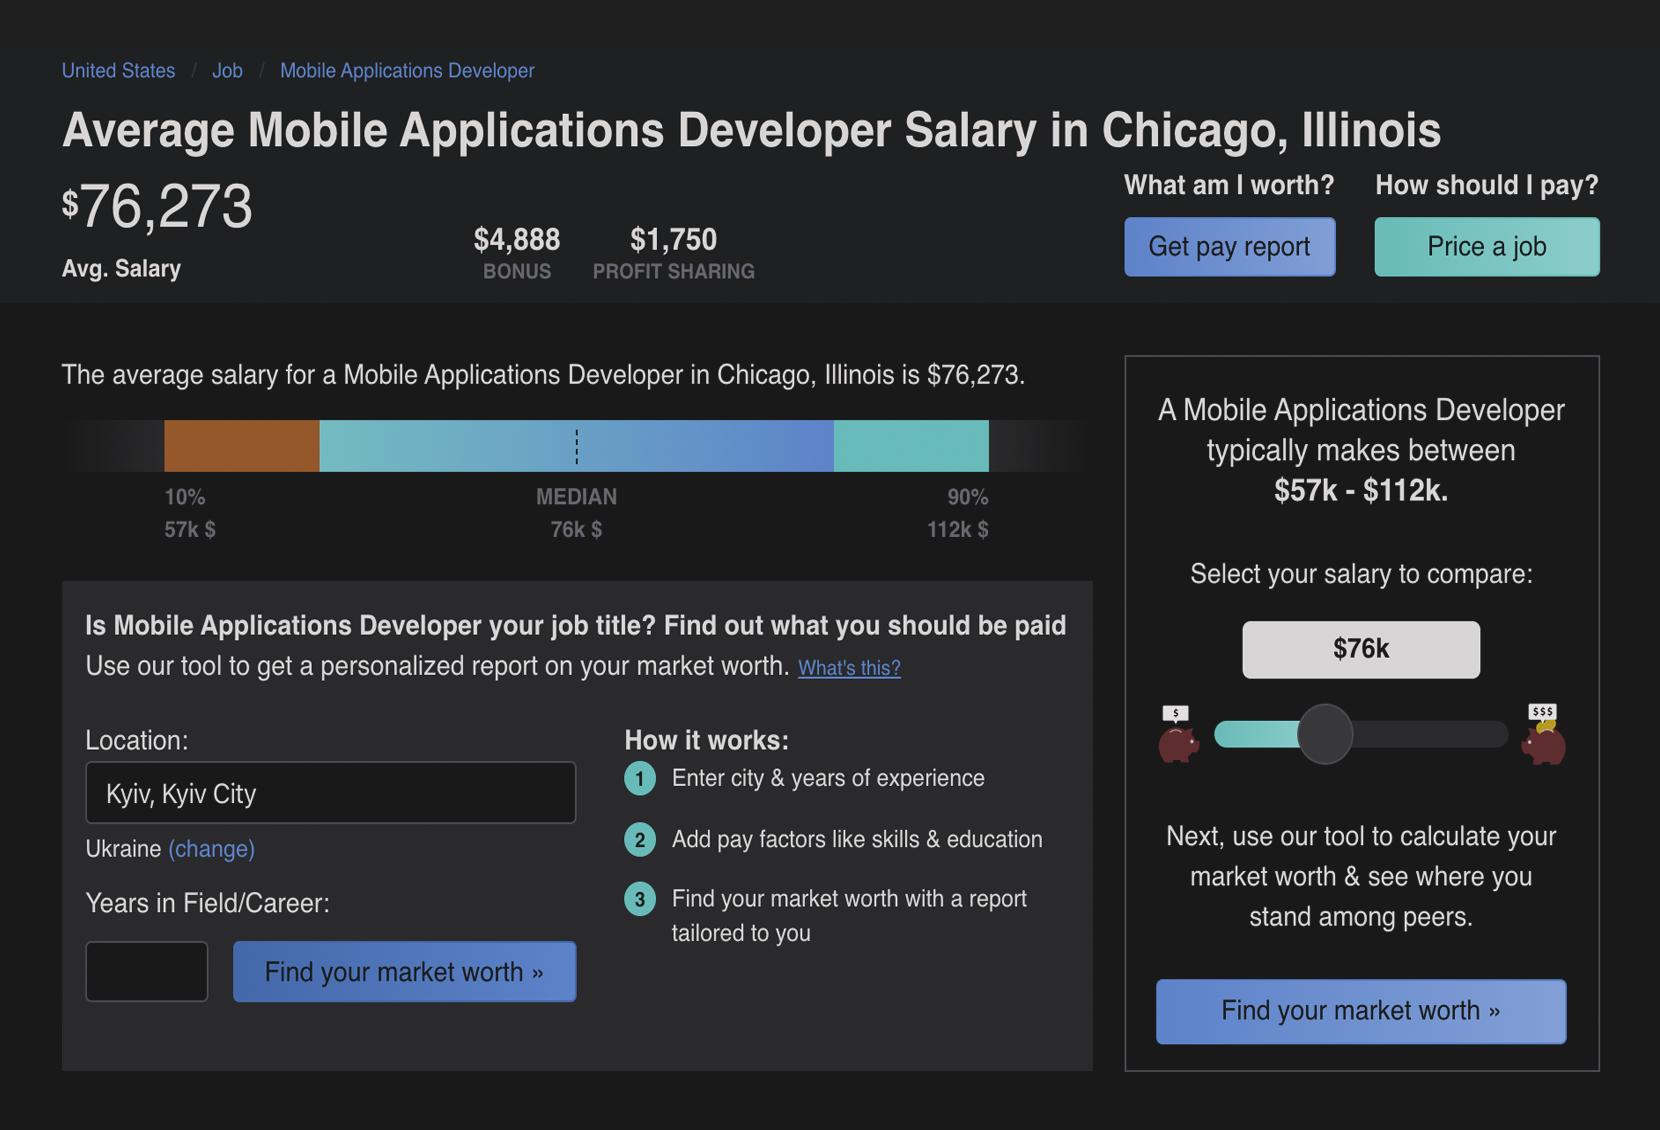 mobila application developer salary in Chicago